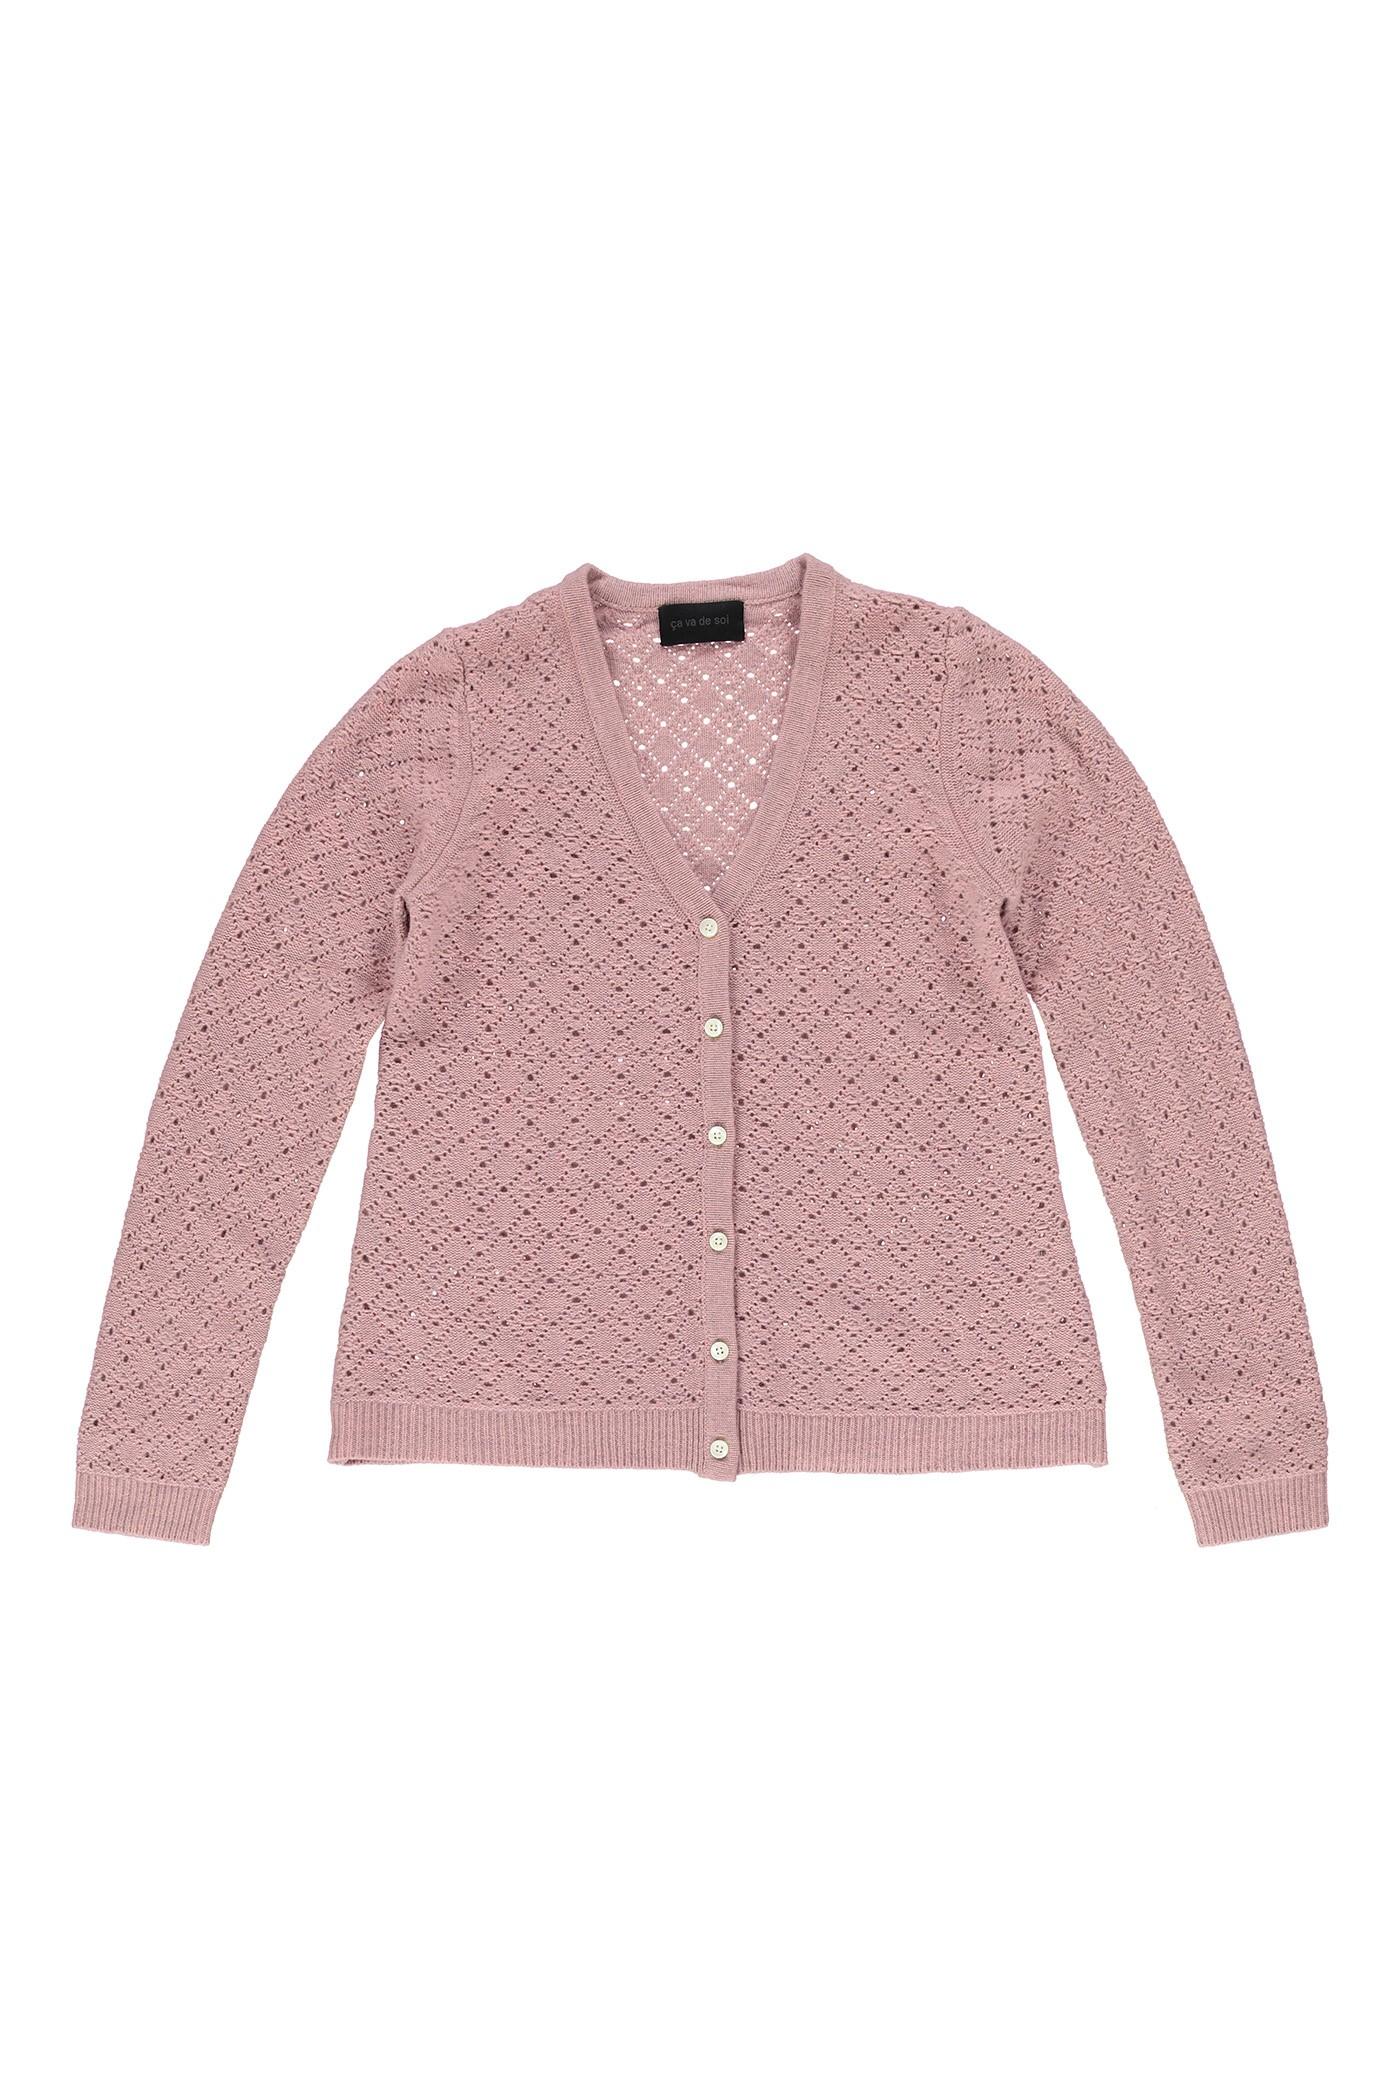 yvette-framboise-f16-cavadesoi-knitwear.jpg